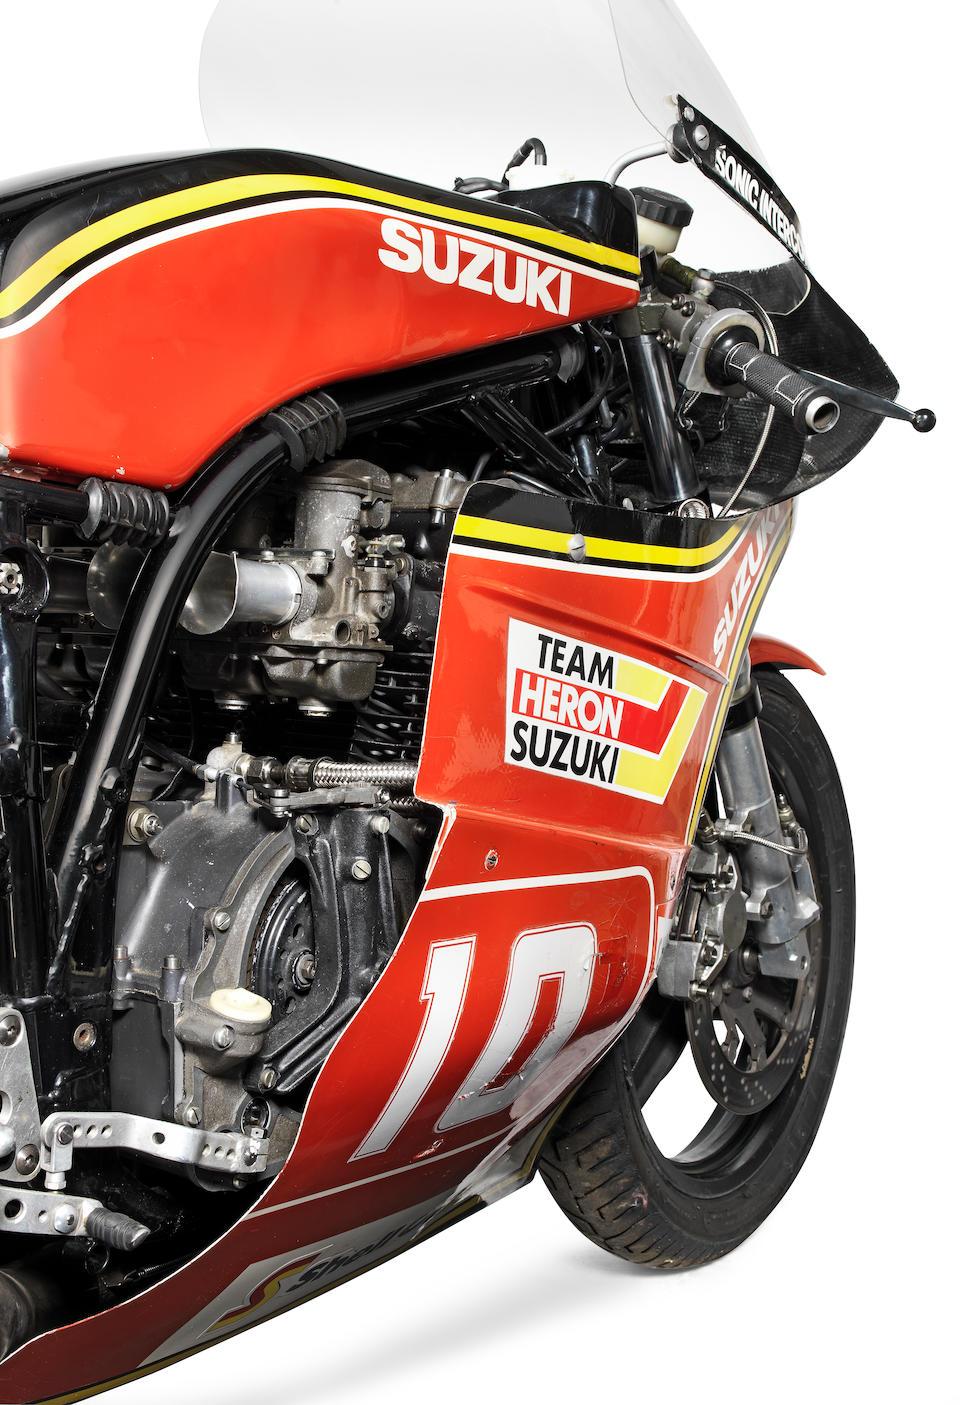 Ex-works; Mick Grant; North West 200-winning, 1982 Suzuki 998cc XR69 TT Formula 1 Racing Motorcycle Engine no. GS100R-83002